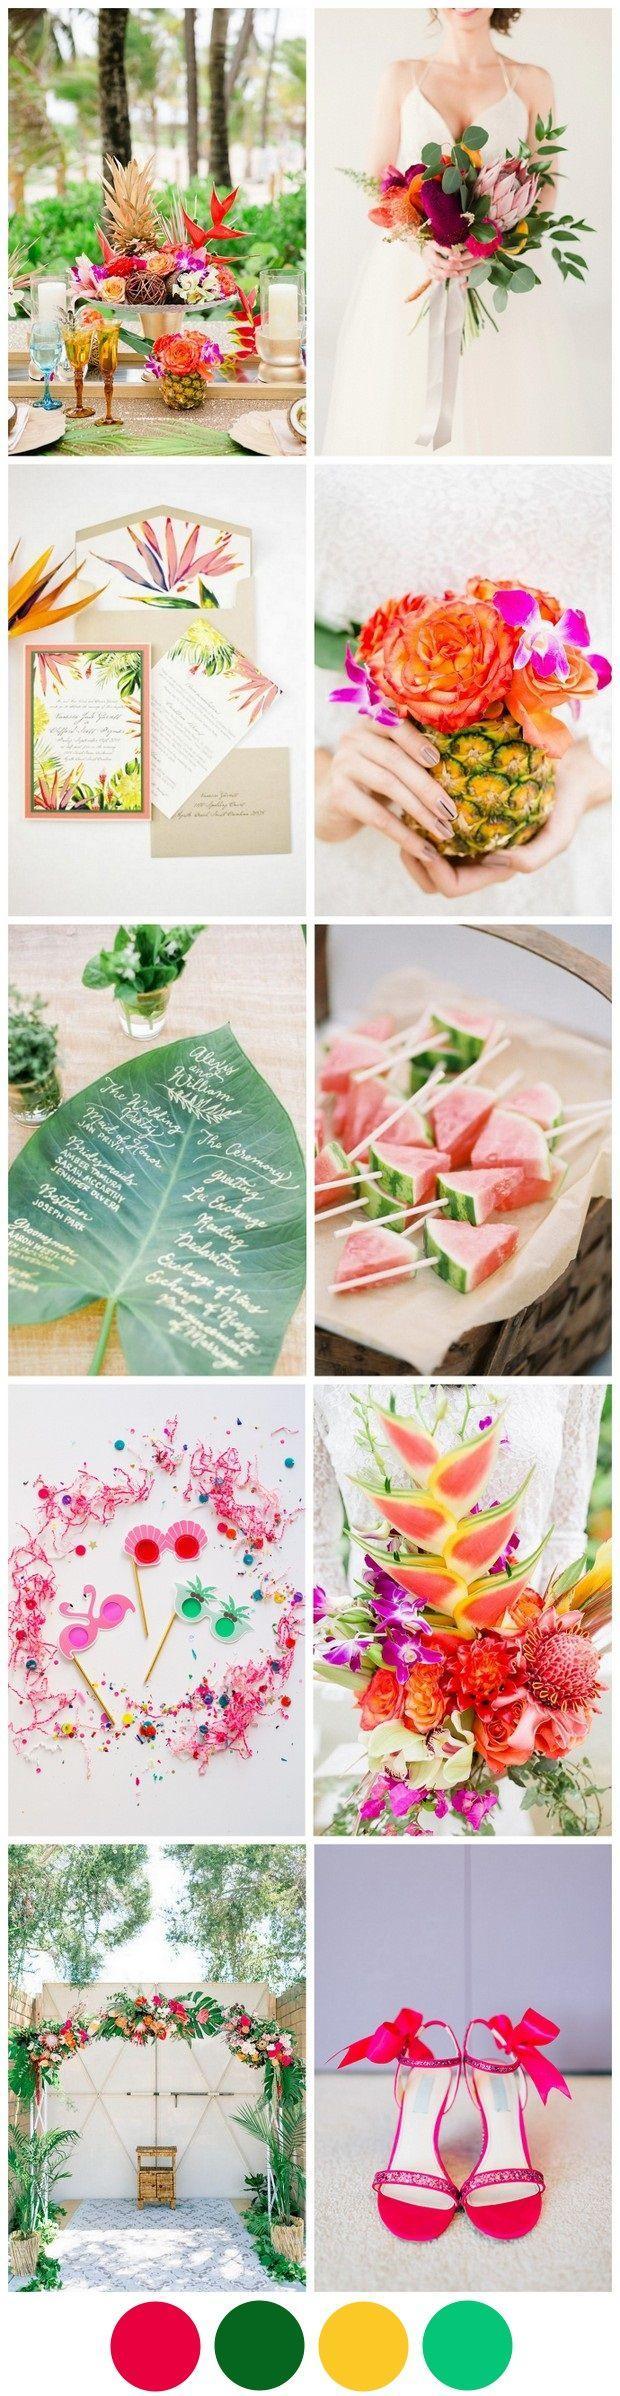 Wedding - The Most Fun Tropical Wedding Theme You've Ever Seen